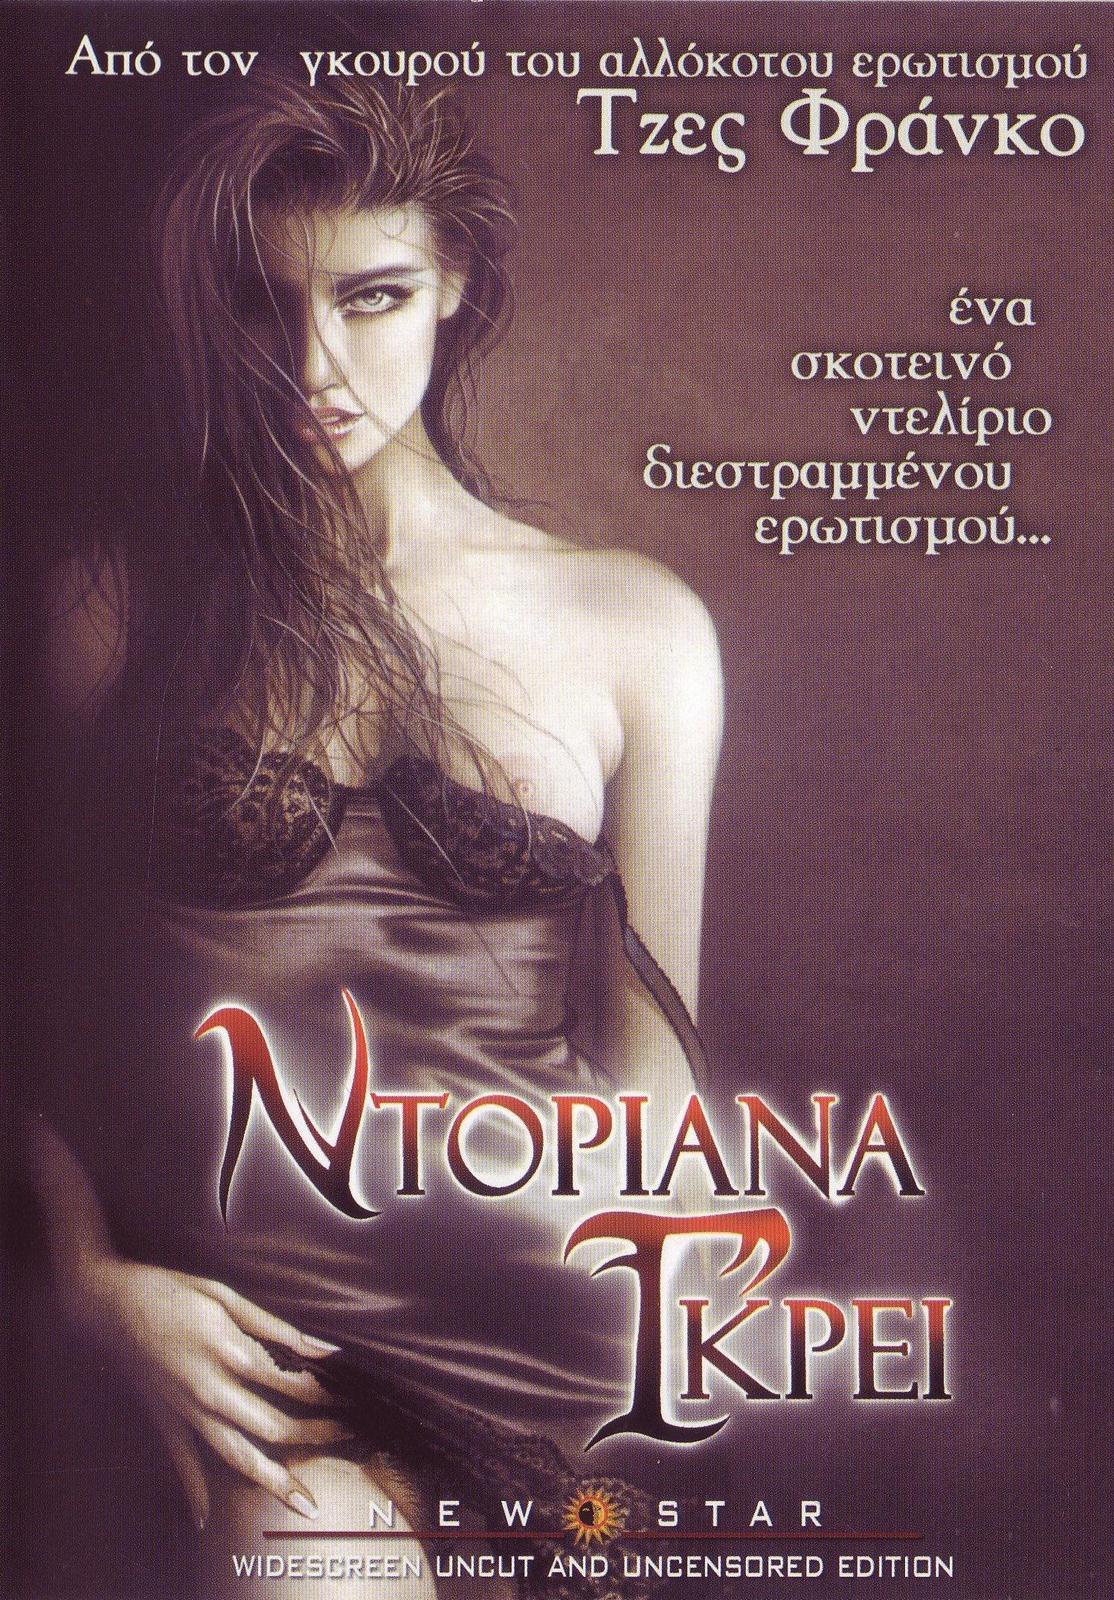 DORIANA GREY - Die Marquise von Sade twin sister LINA ...